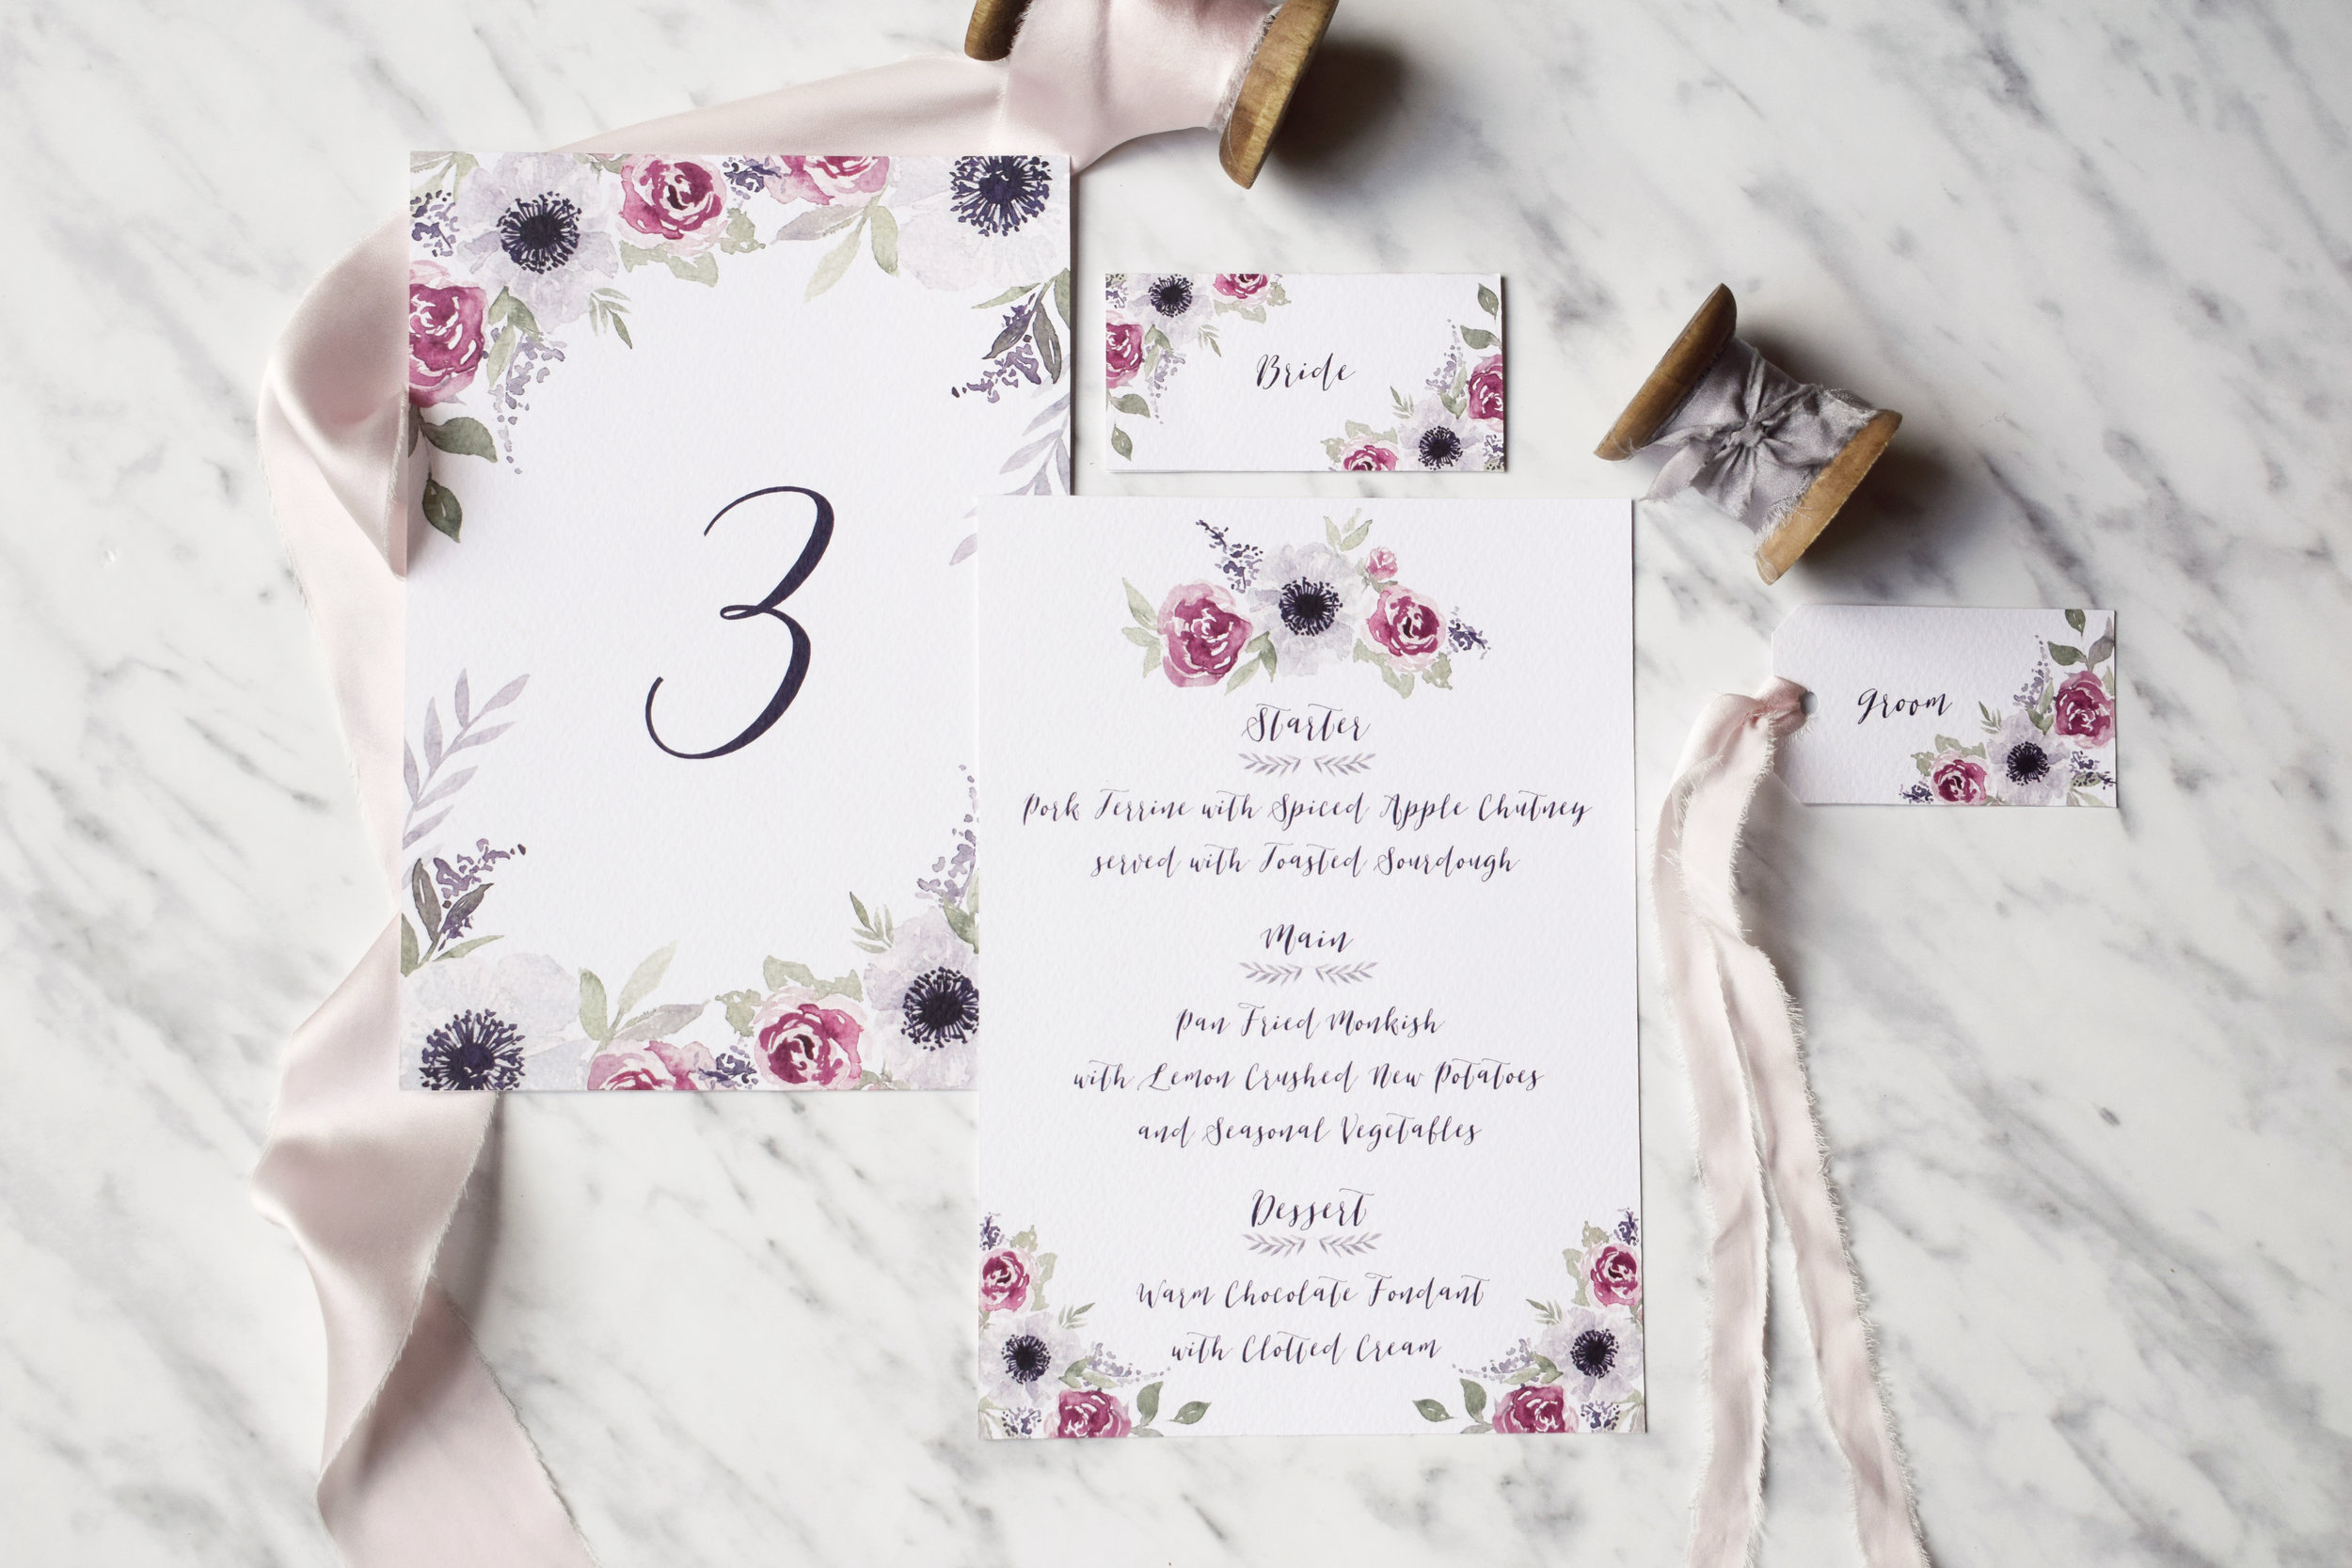 Secret Garden Wedding Reception Stationery.jpg